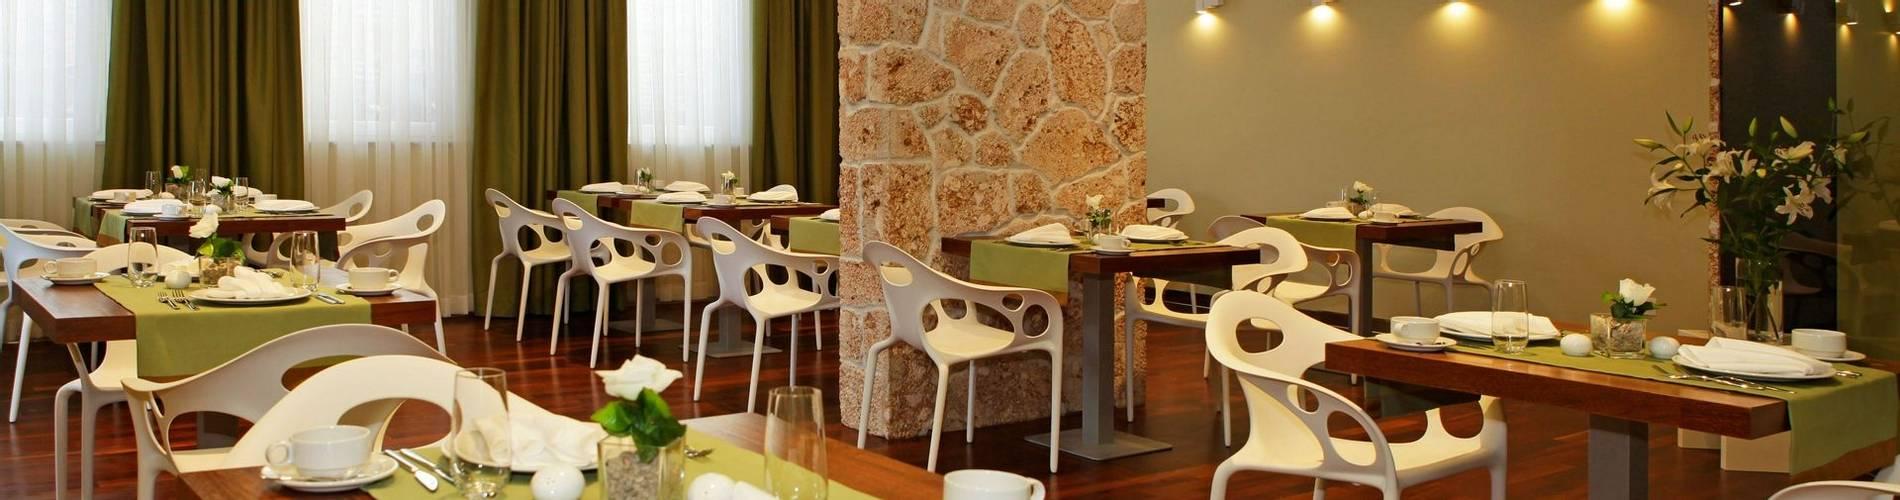 Hotel Bol, Central Dalmatia, Croatia (37).jpg